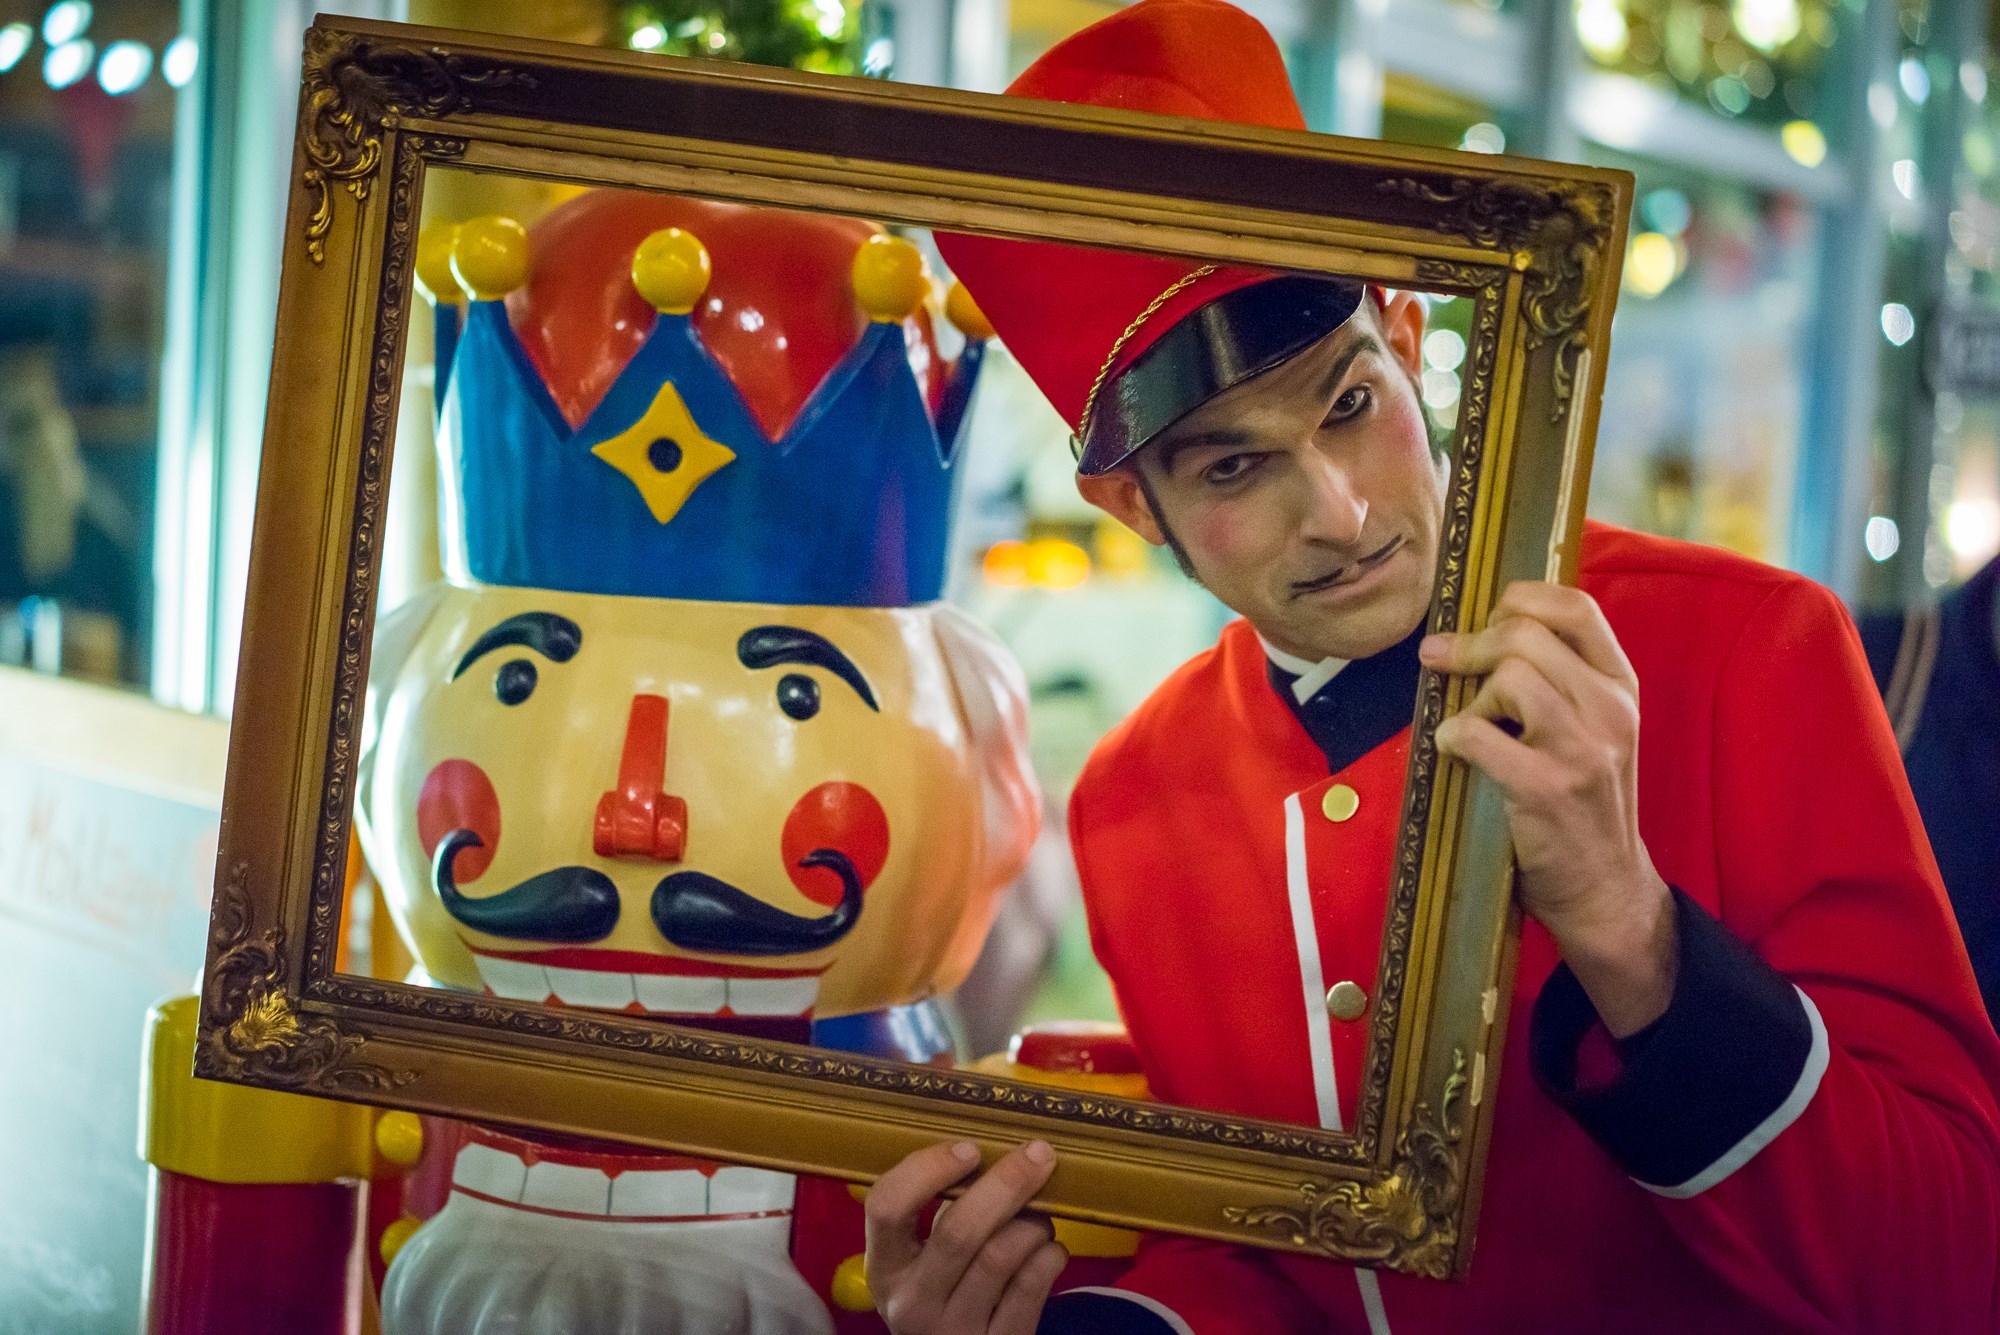 Nussknacker Pantomime Popkultur elias rahmen